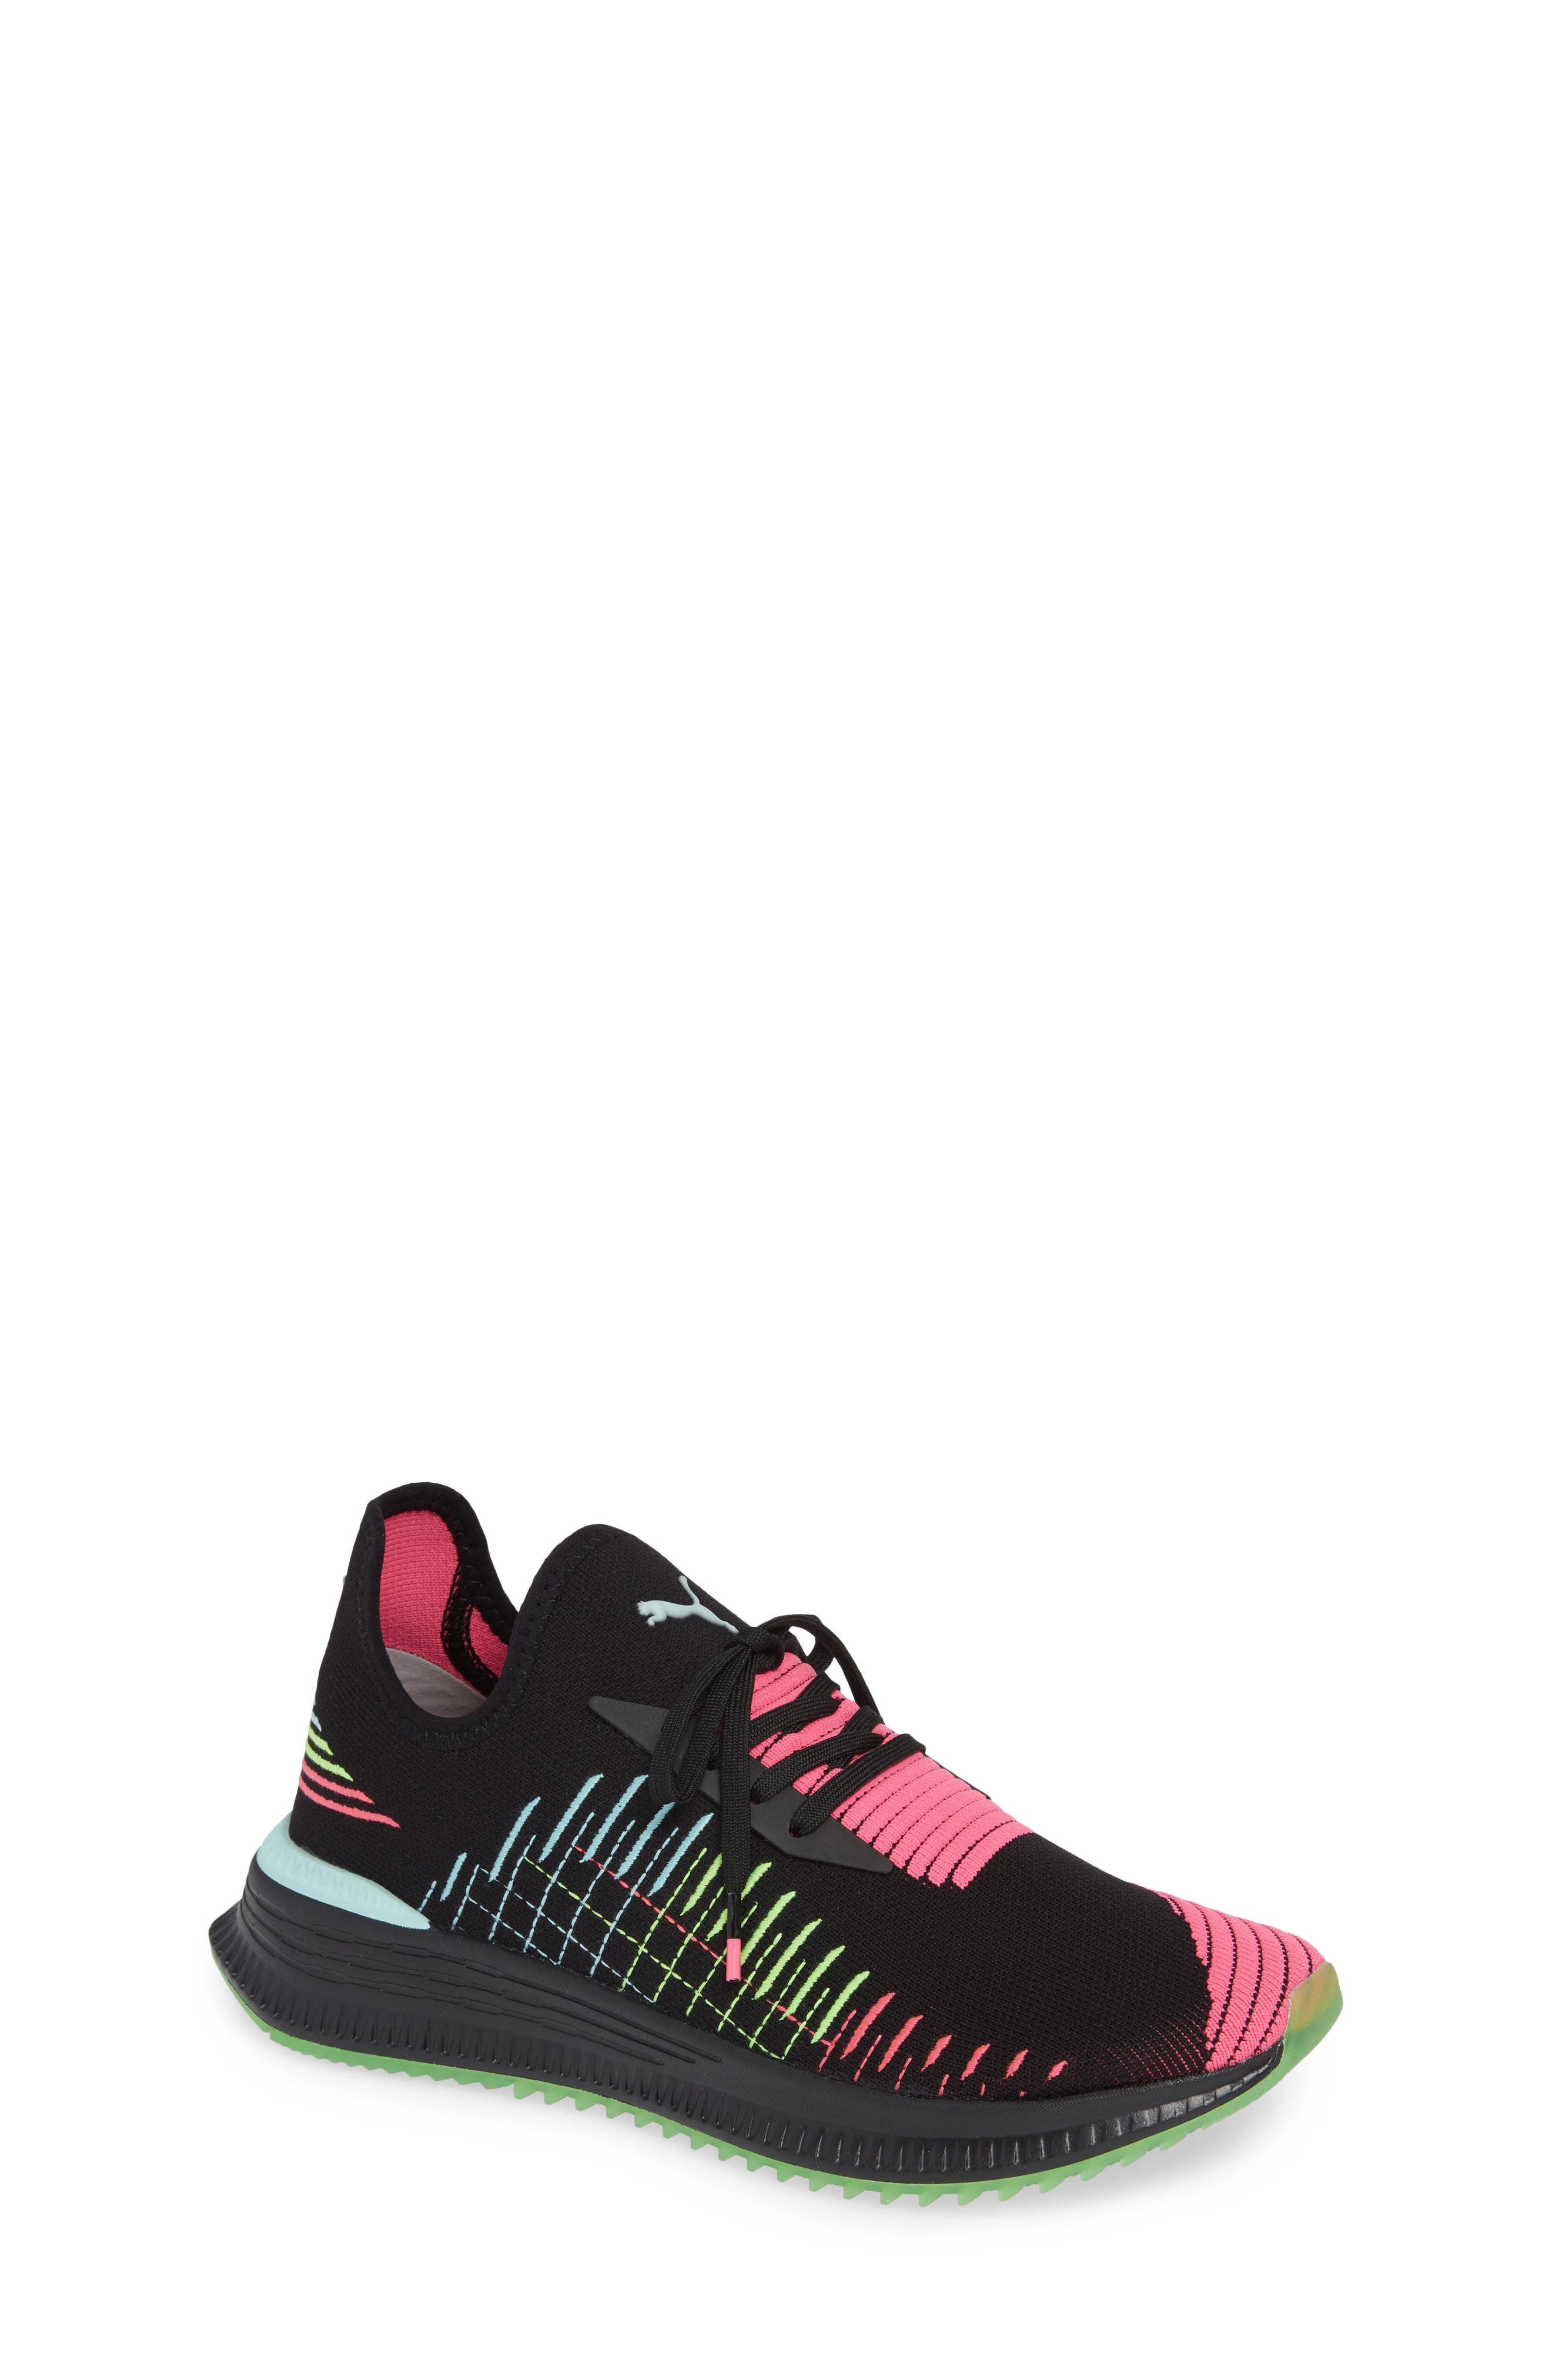 AVID EvoKNIT Sneaker,                             Main thumbnail 1, color,                             BLACK/ PINK/ ISLAND PARADISE